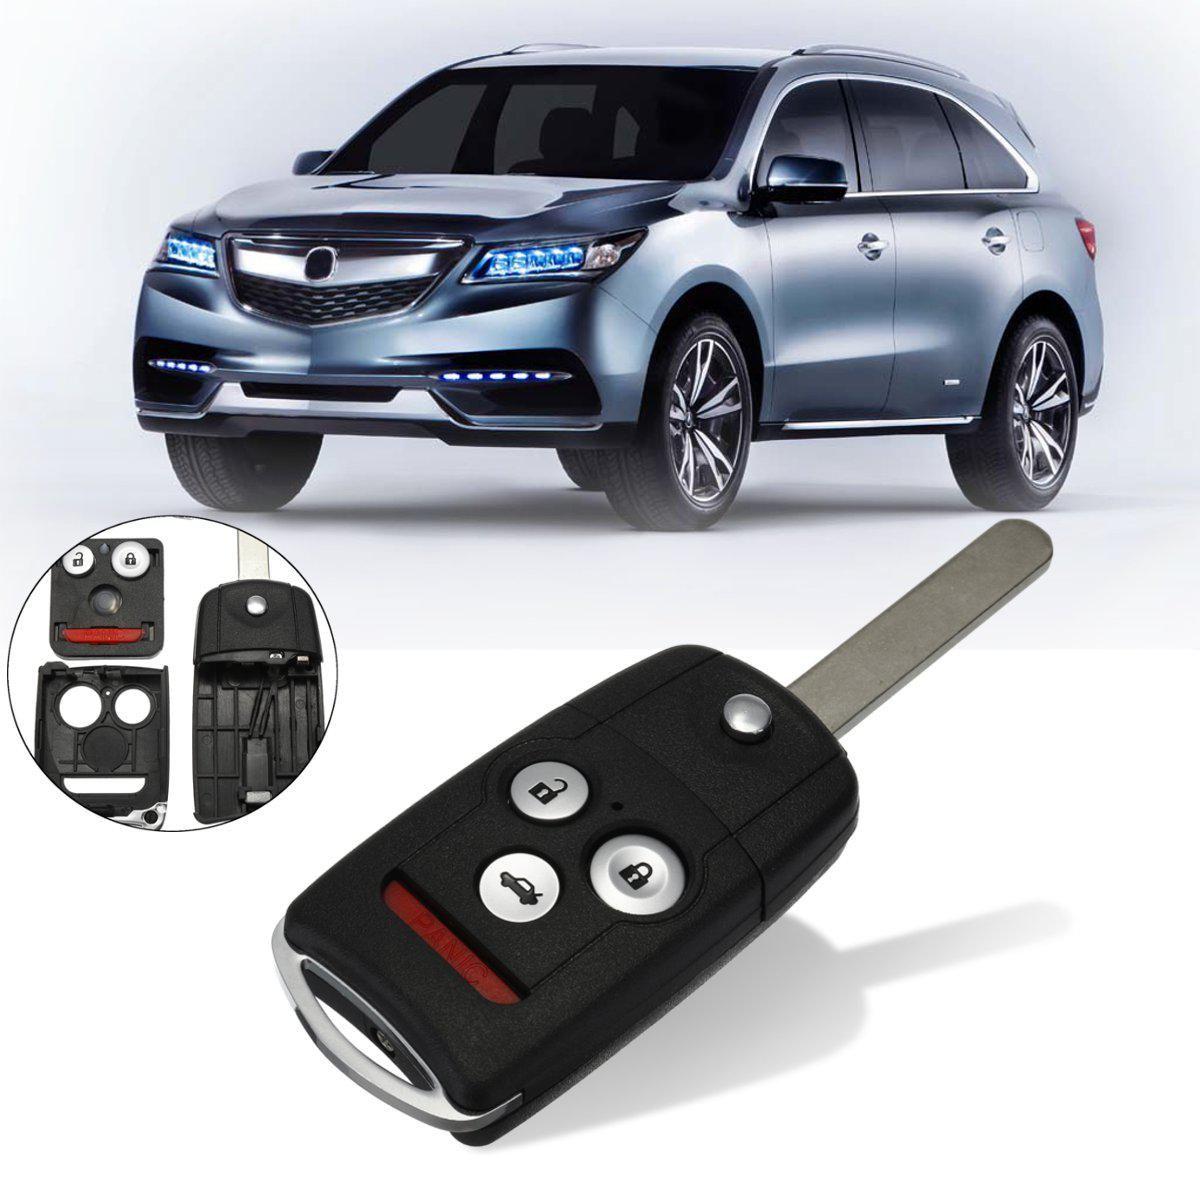 #KK-2620 3+1 Buttons Remote Flip Car Key Fob Shell Case W